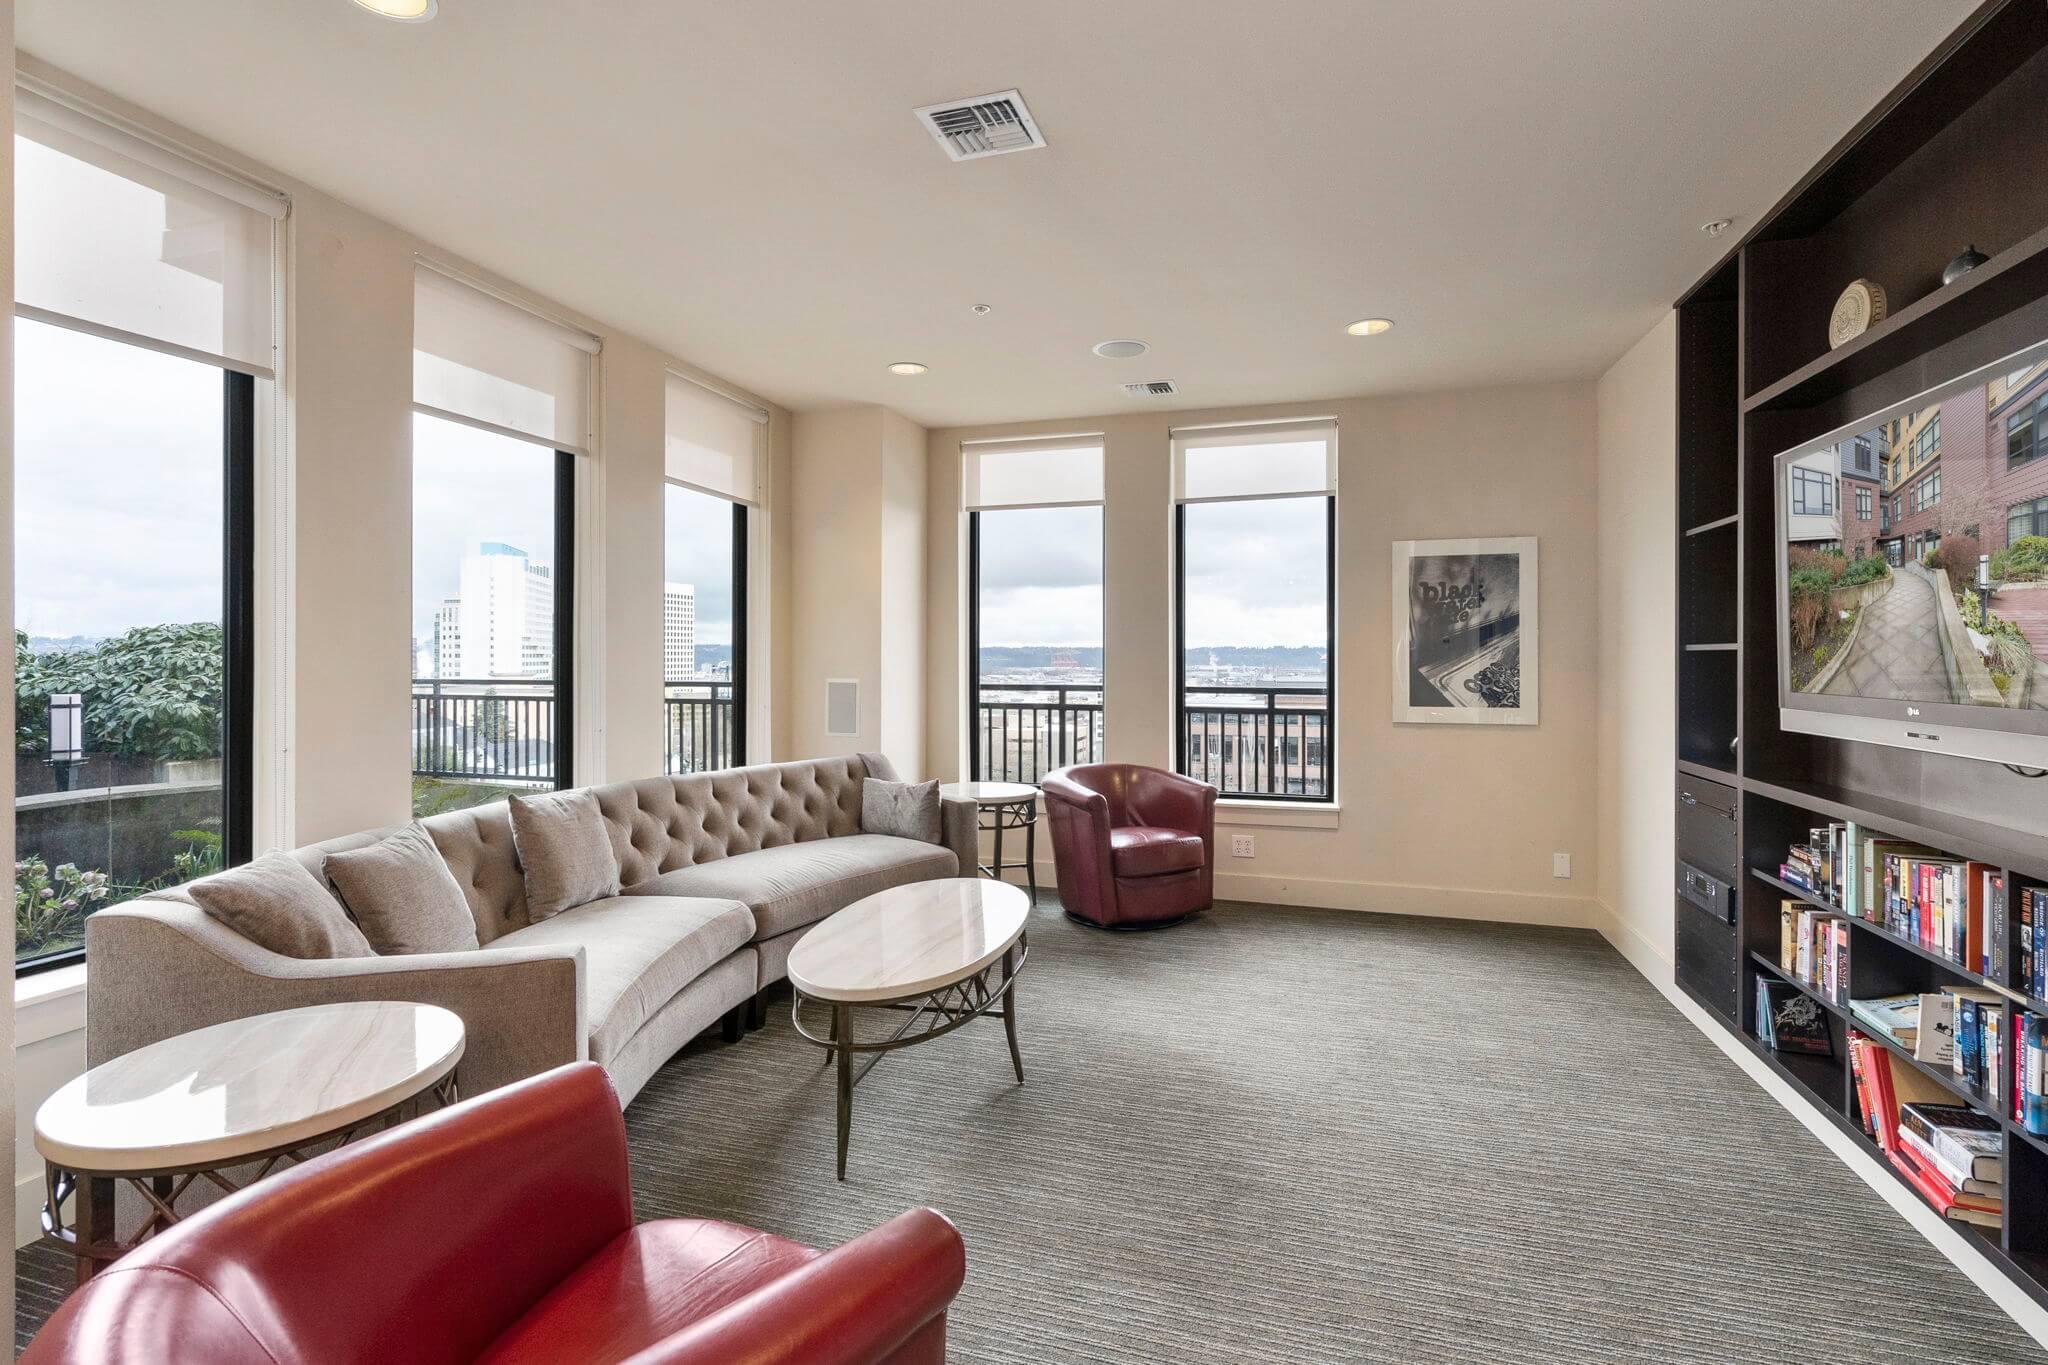 Club room media space